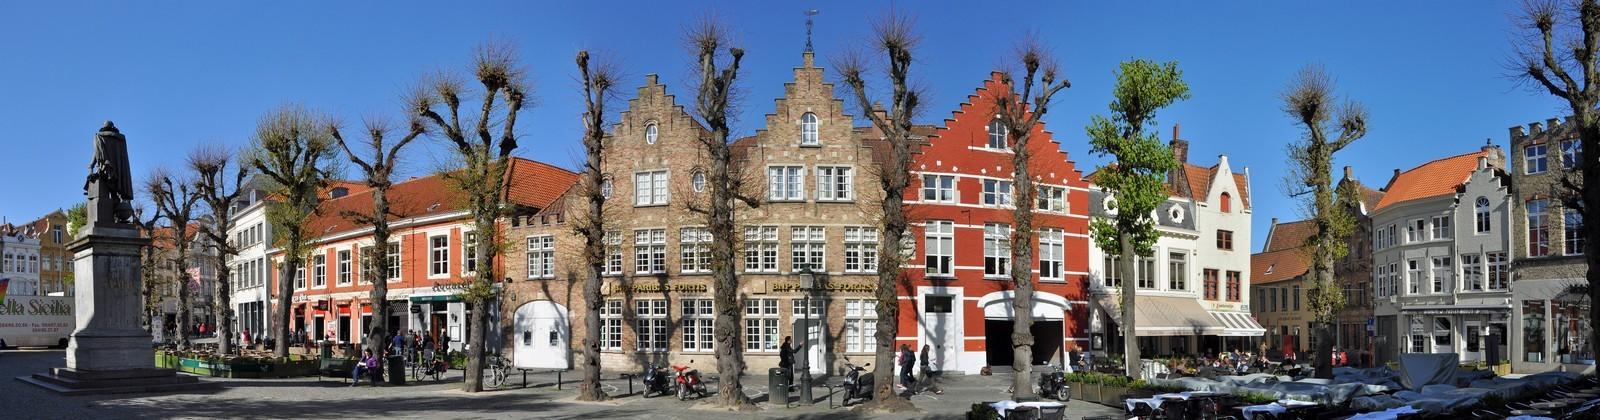 Brugge_Simon_Stevinplein_Panorama_R01